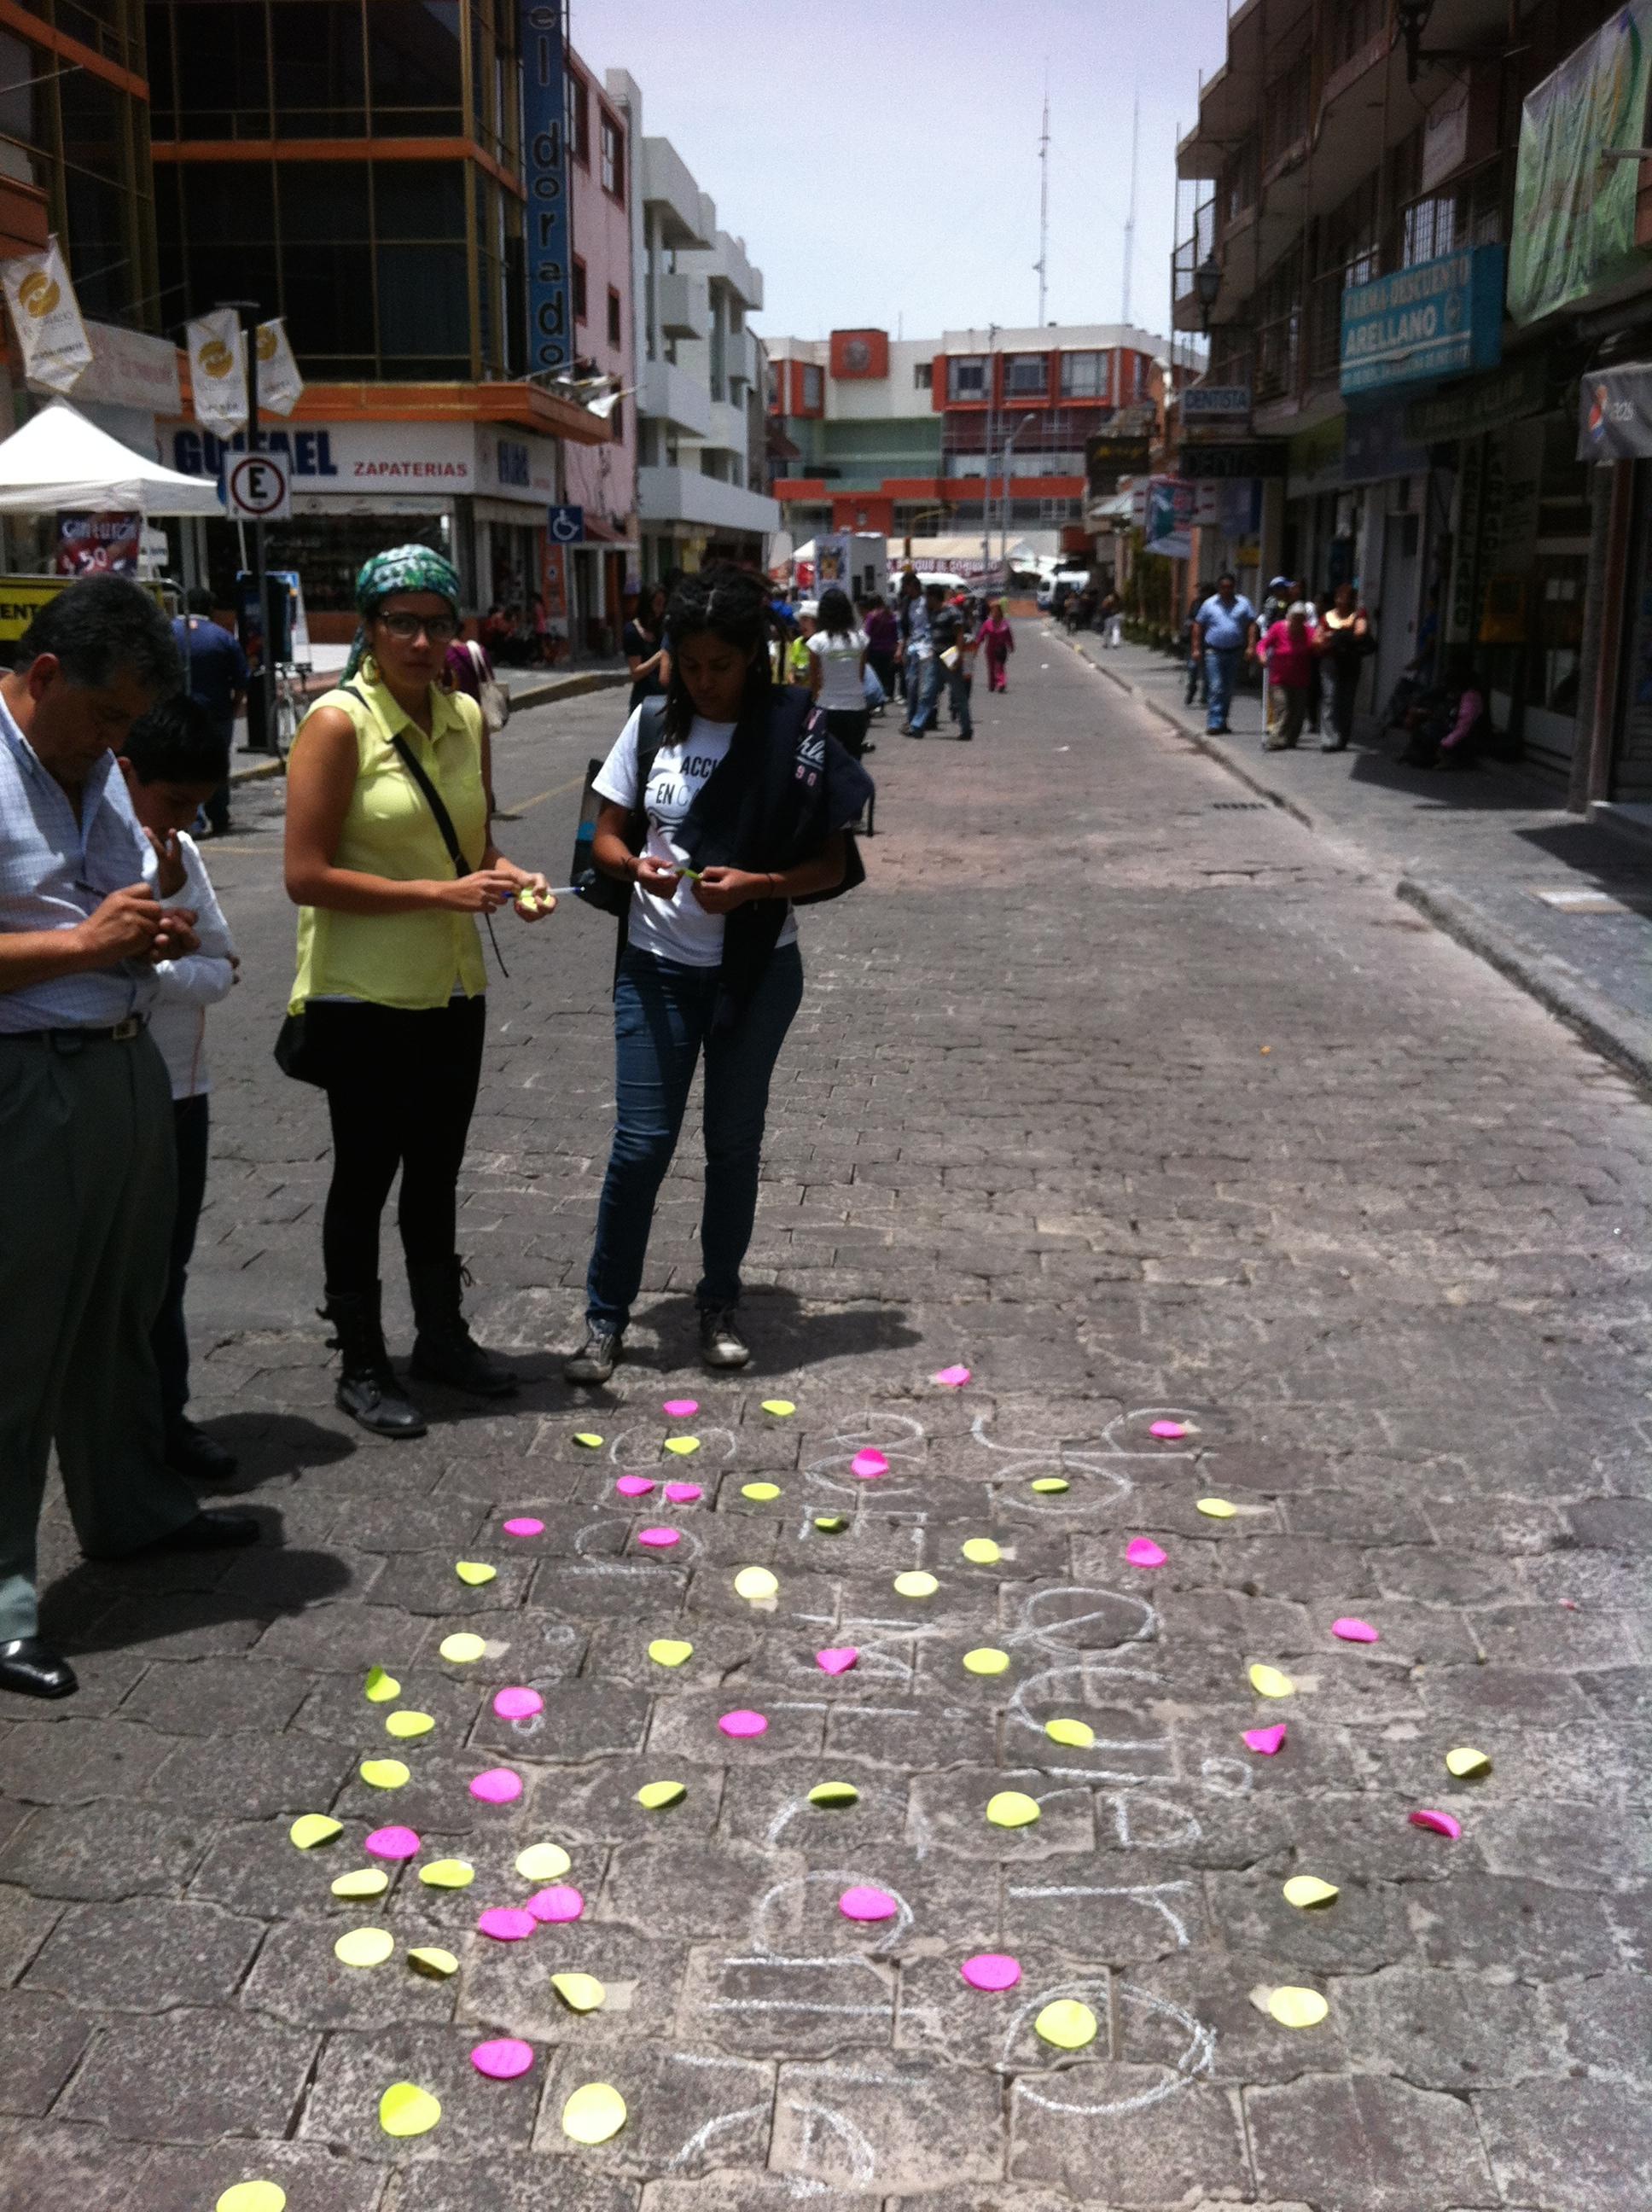 #guerrereando YO QUIERO QUE ESTA CALLE #1congresopeatonal organizado por Liga Peatonal